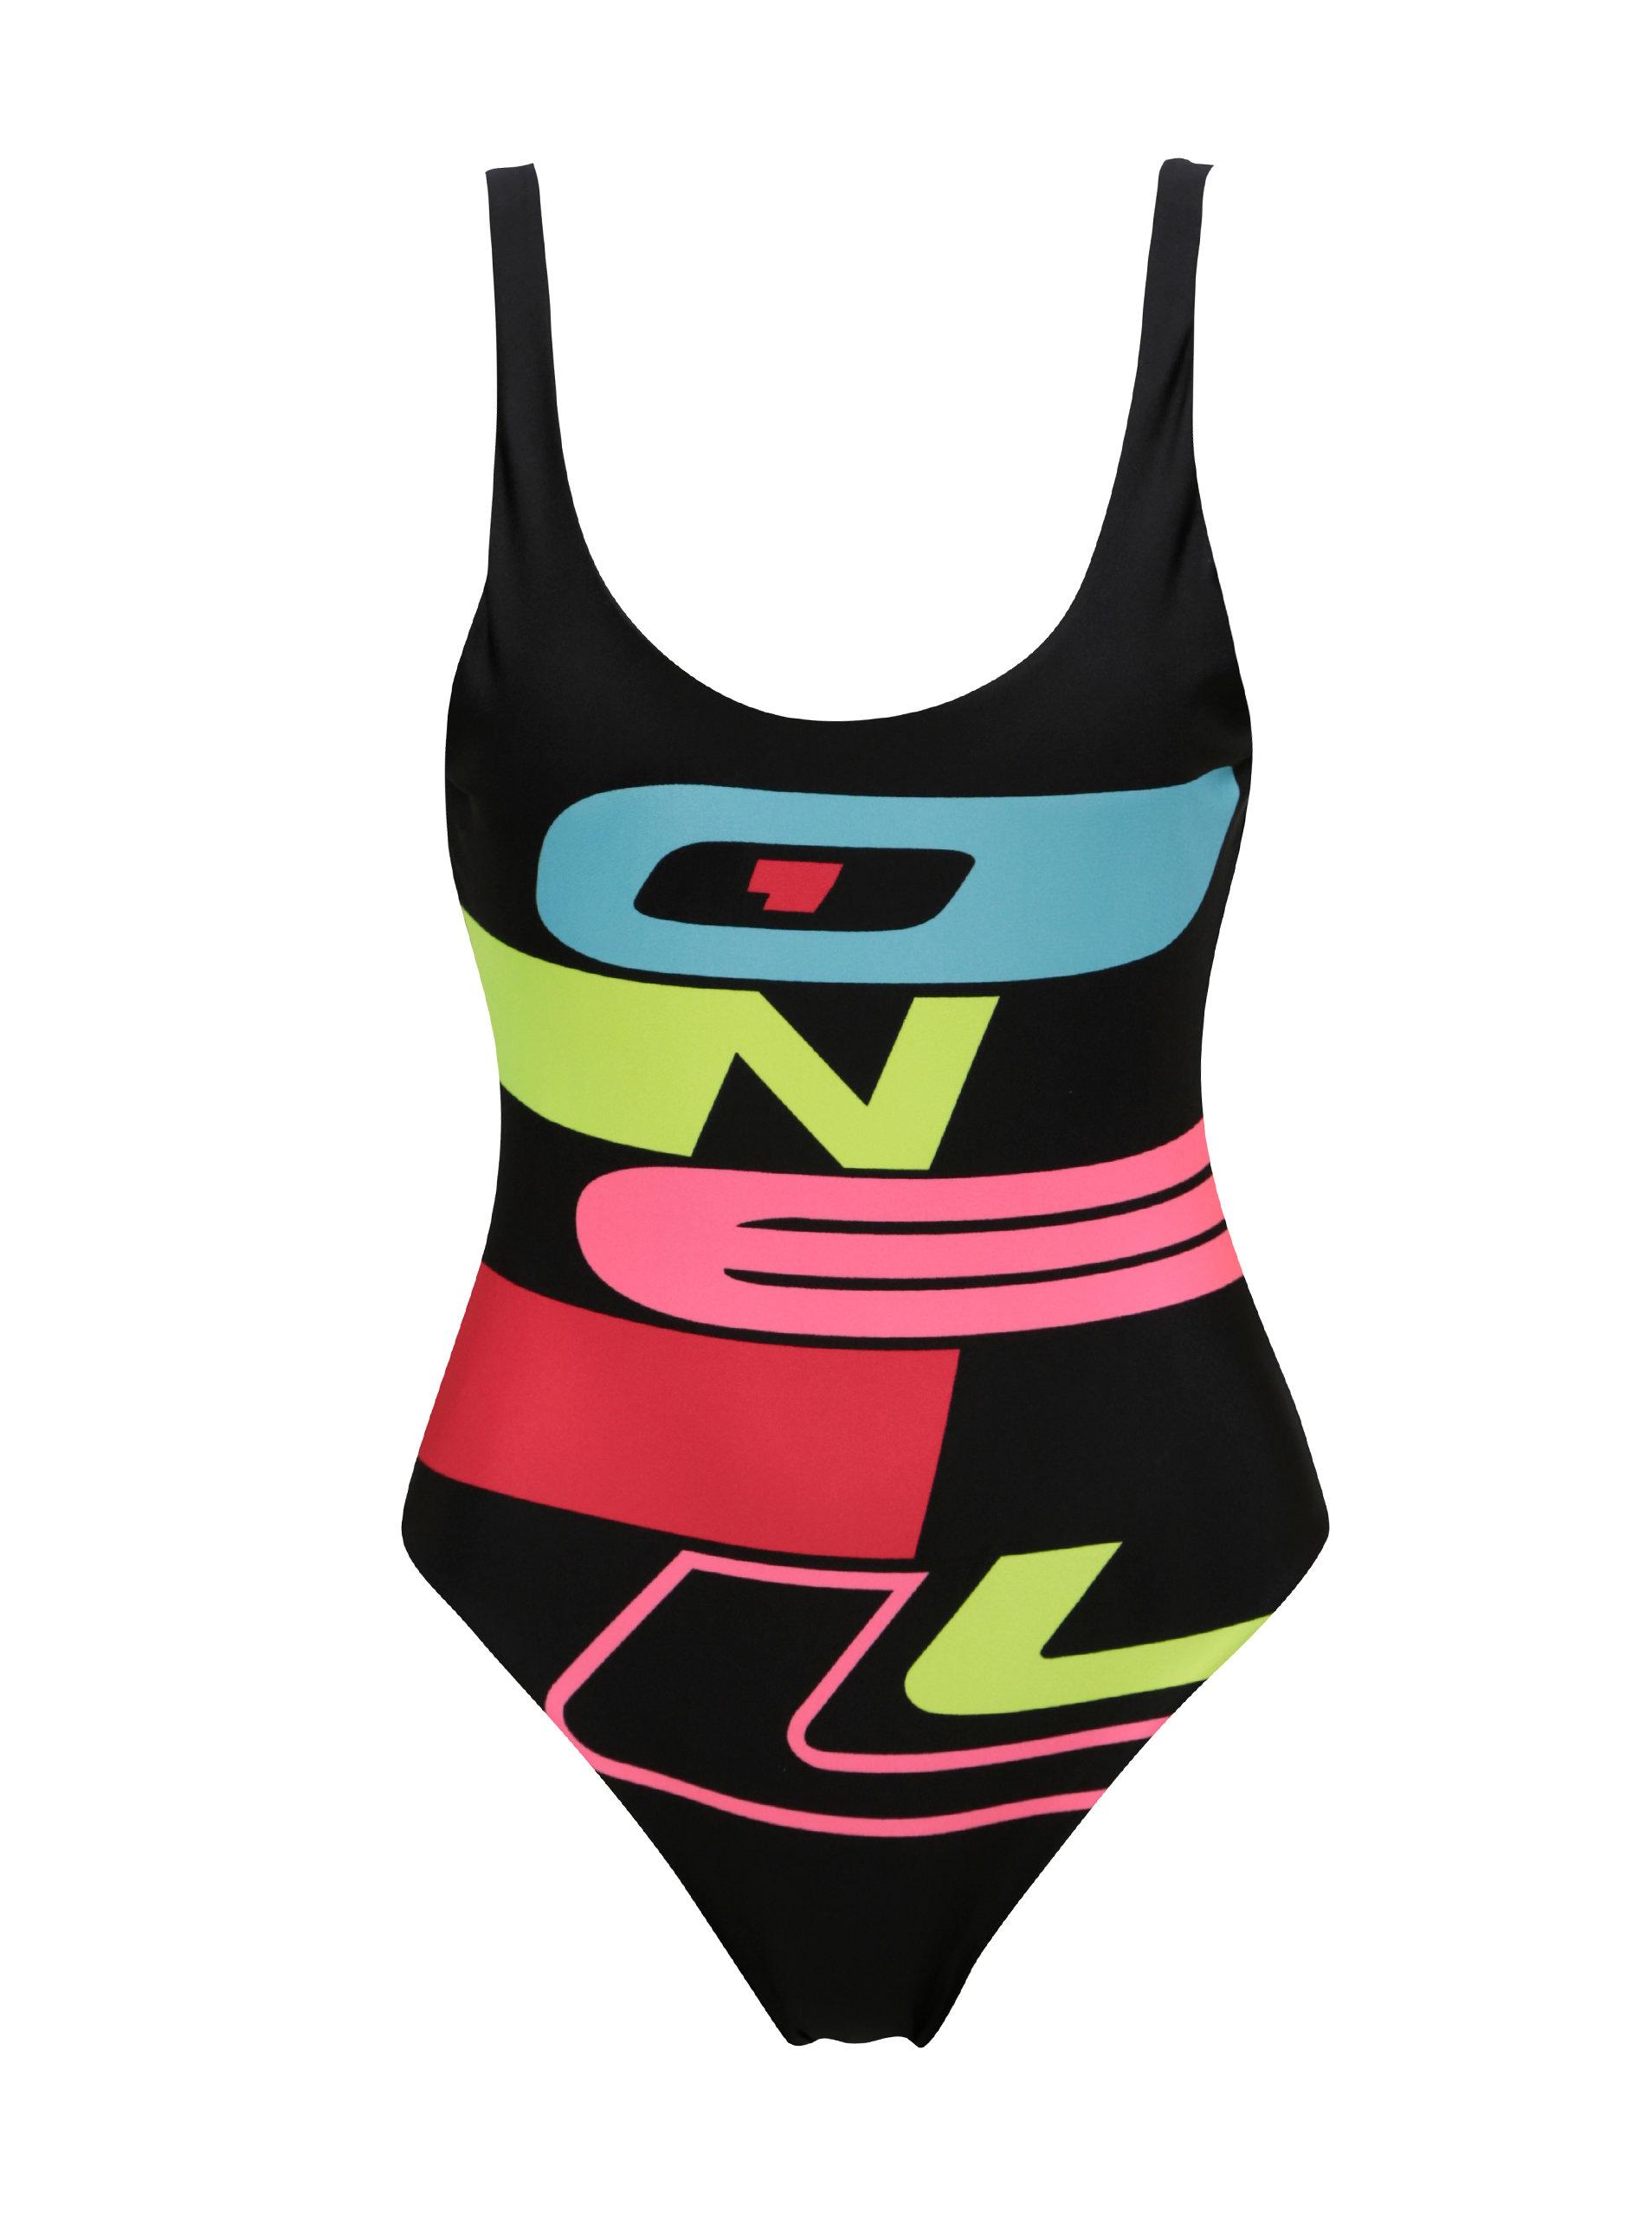 6b1056b23a5 Černé dámské plavky s výstřihem na zádech O Neill Issue ...